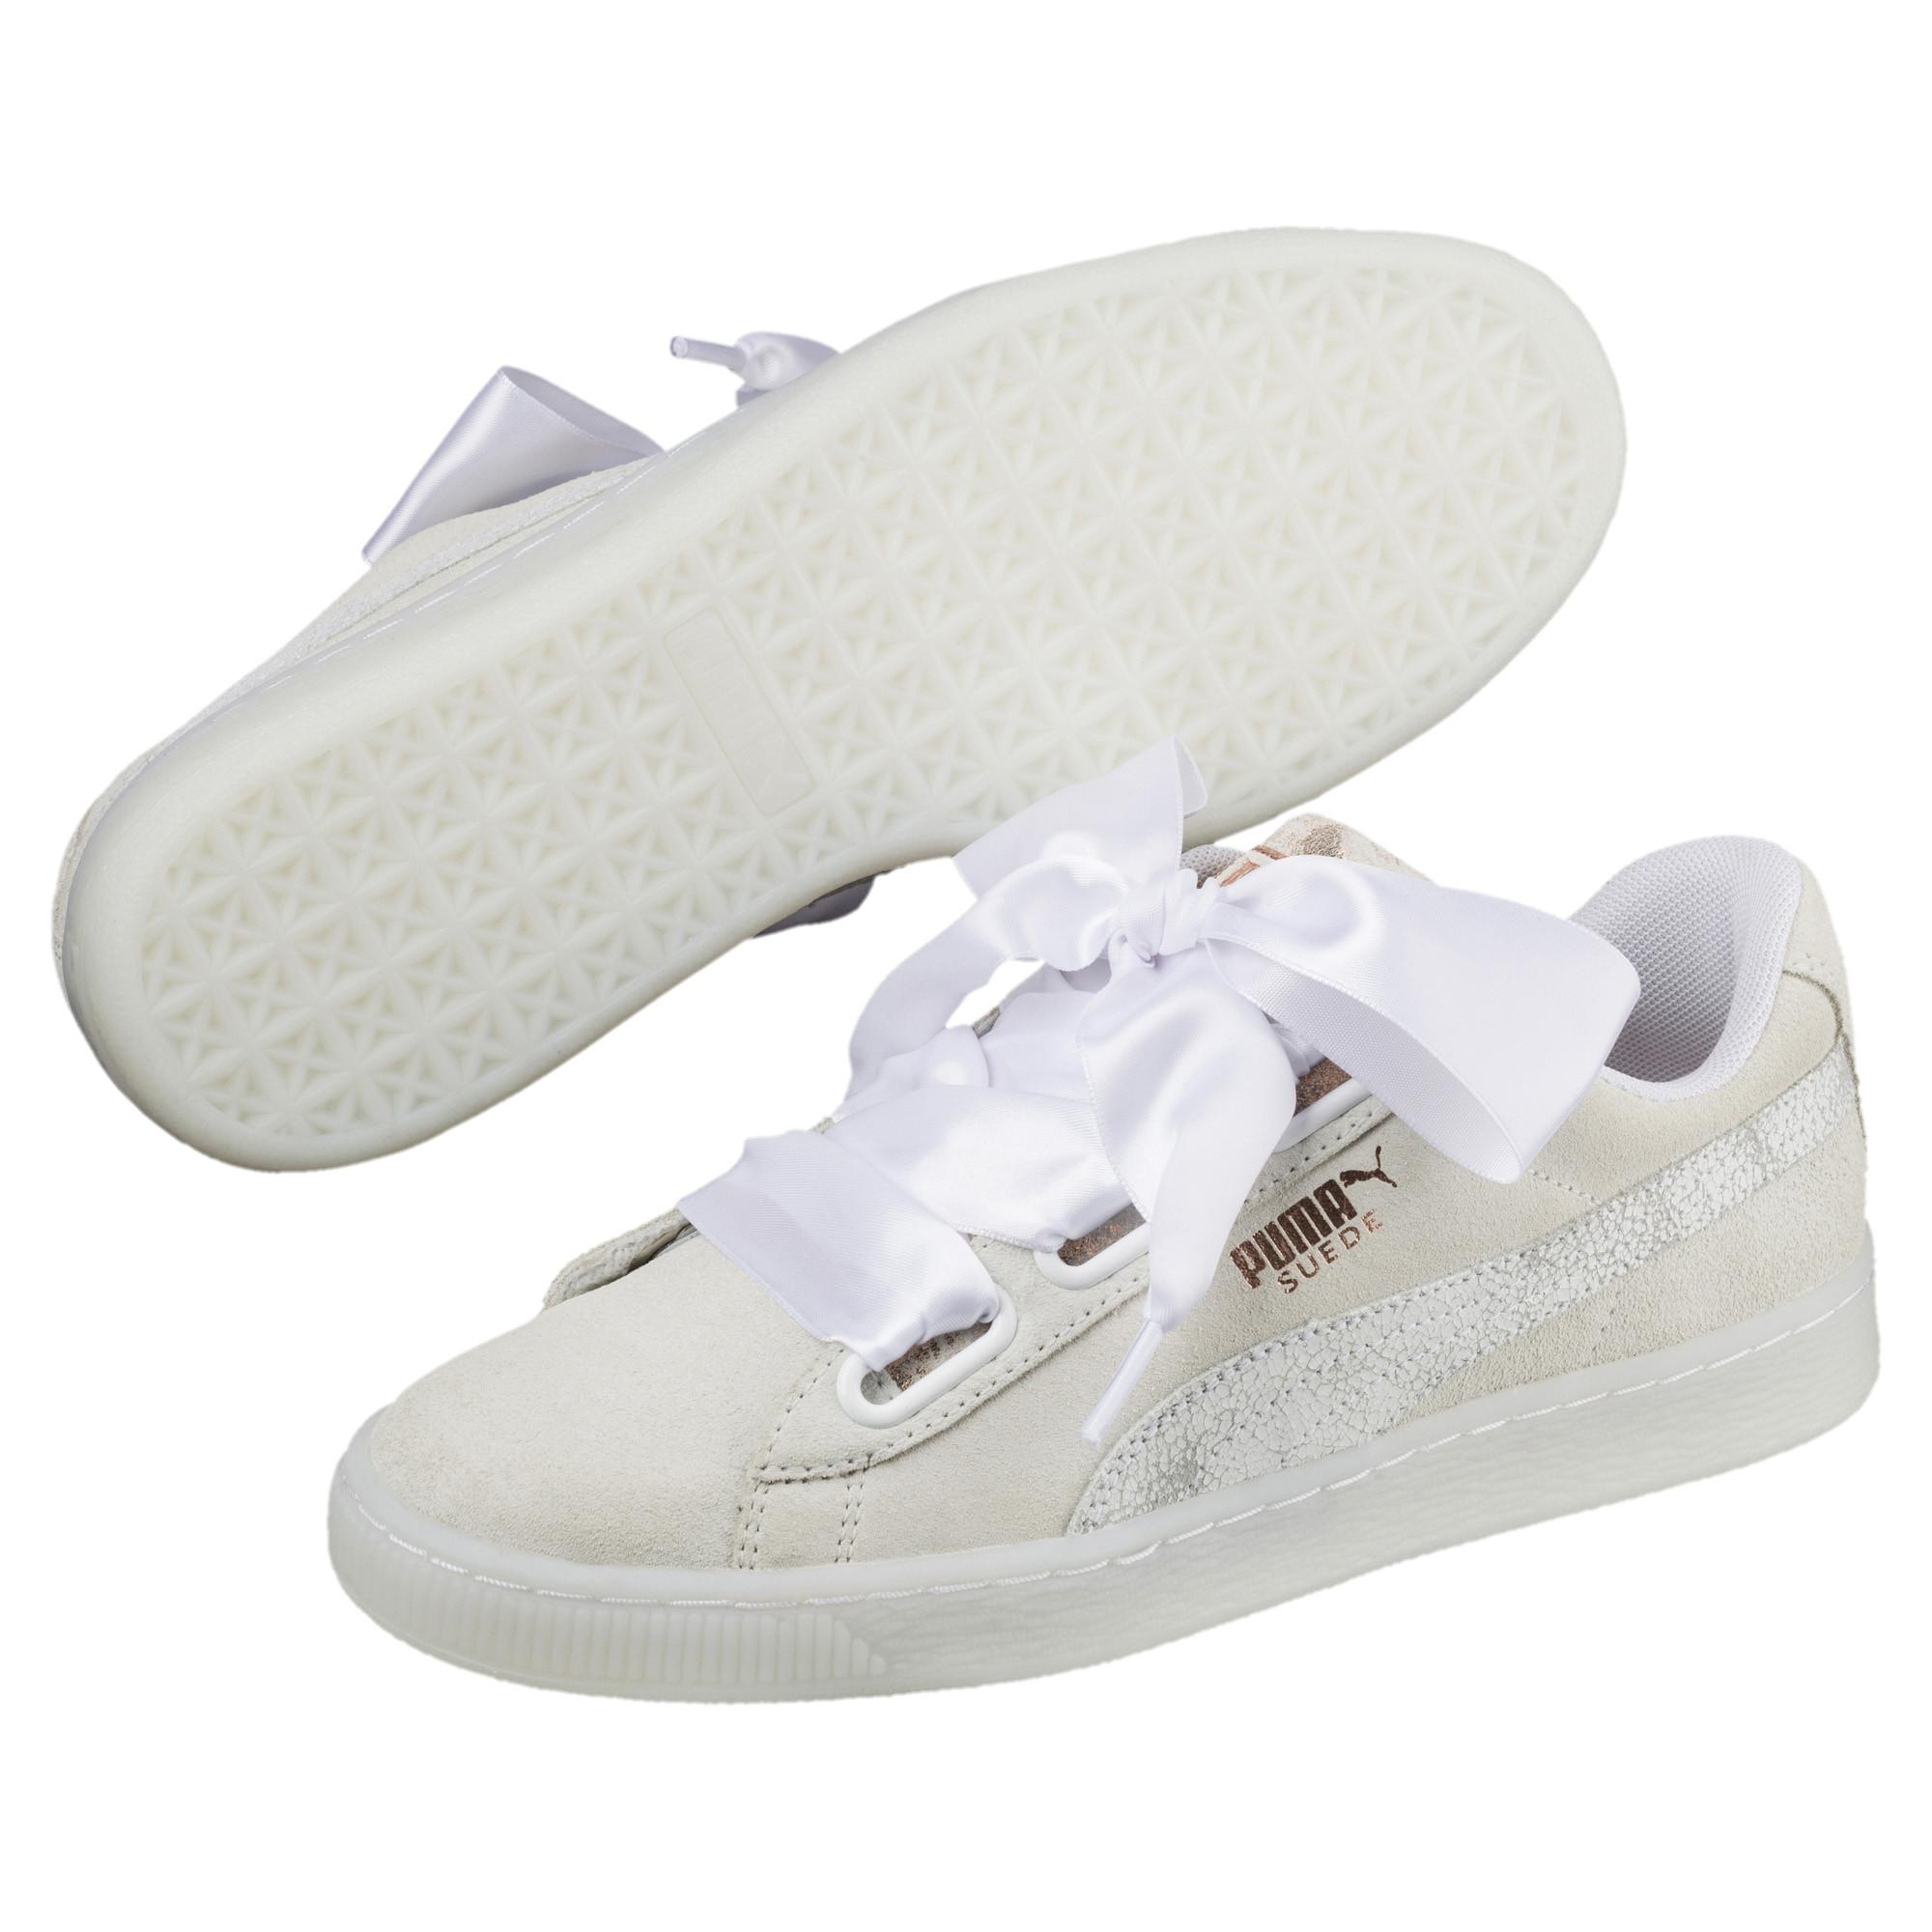 f0d6117b2c2 PUMA - White Suede Heart Arctica Women s Sneakers - Lyst. View fullscreen